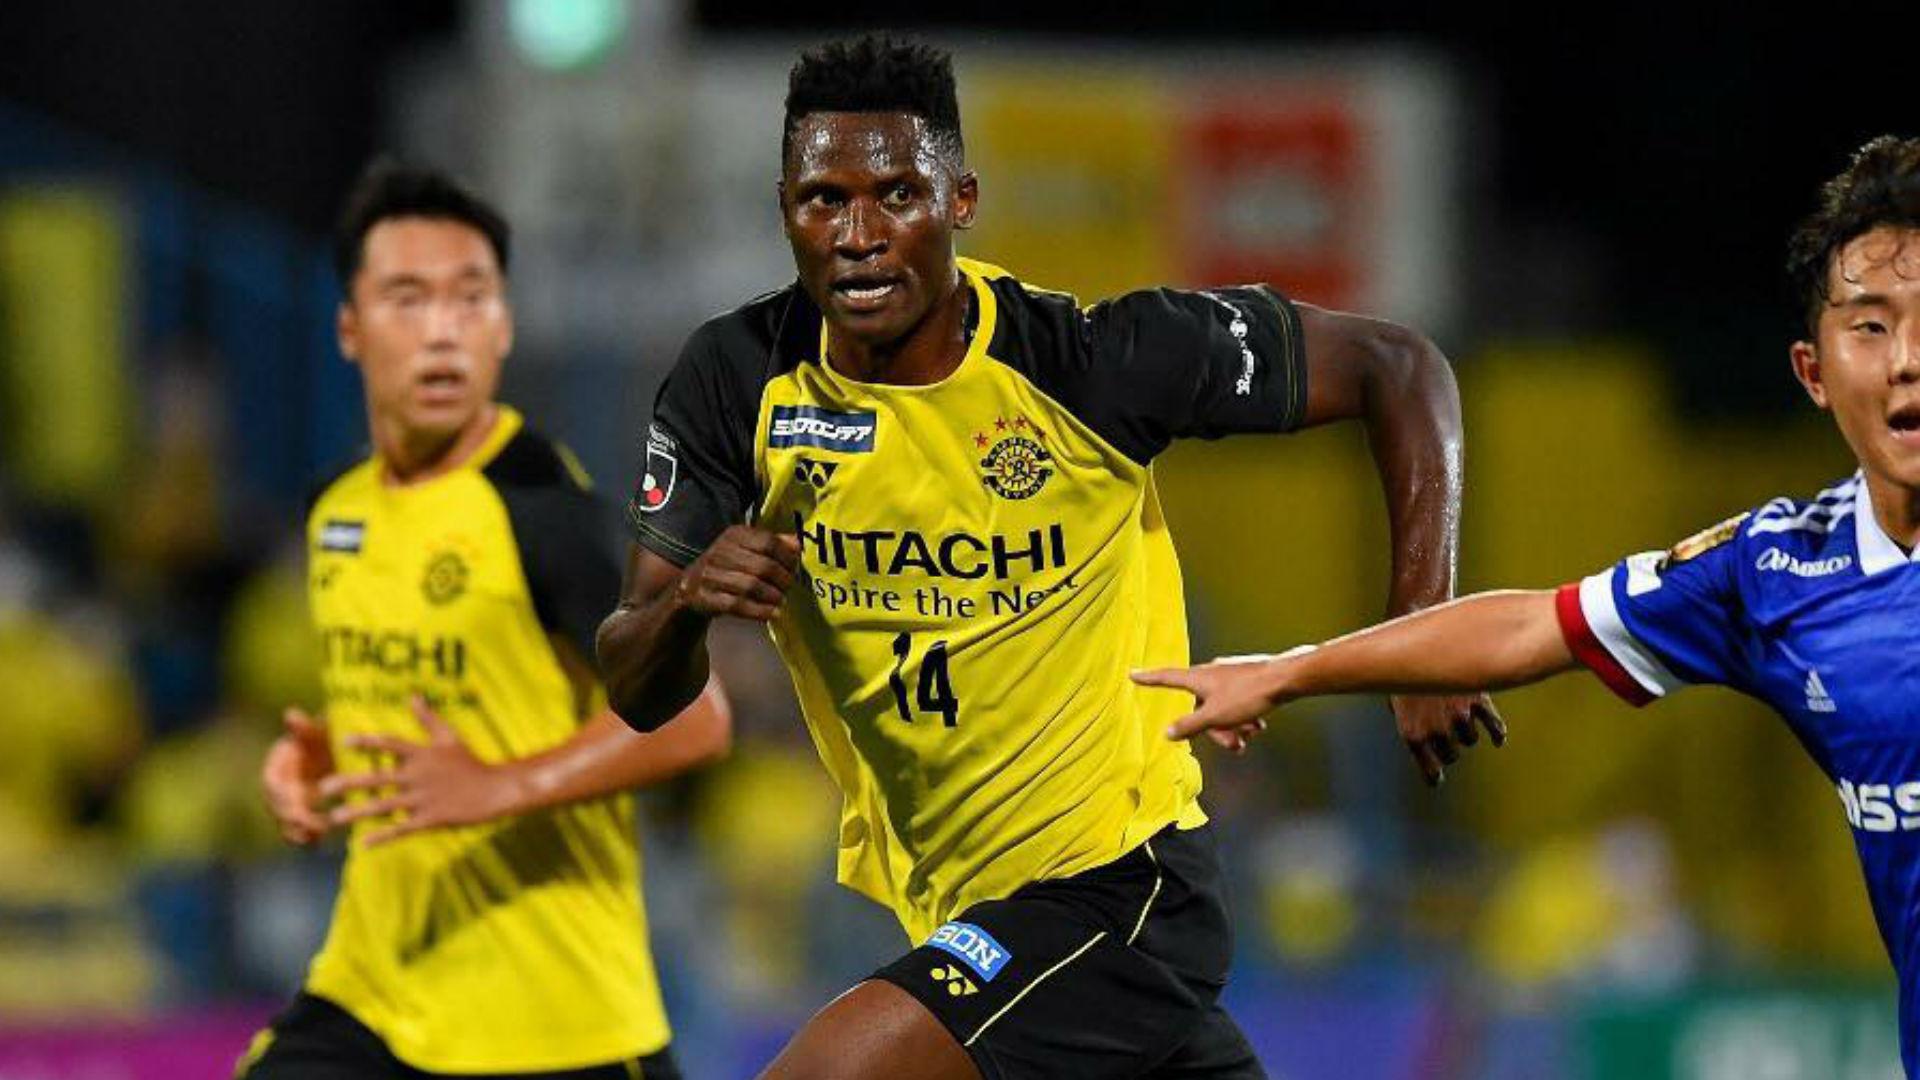 Olunga on target as Kashiwa Reysol bounce back with win over Kashima Antlers